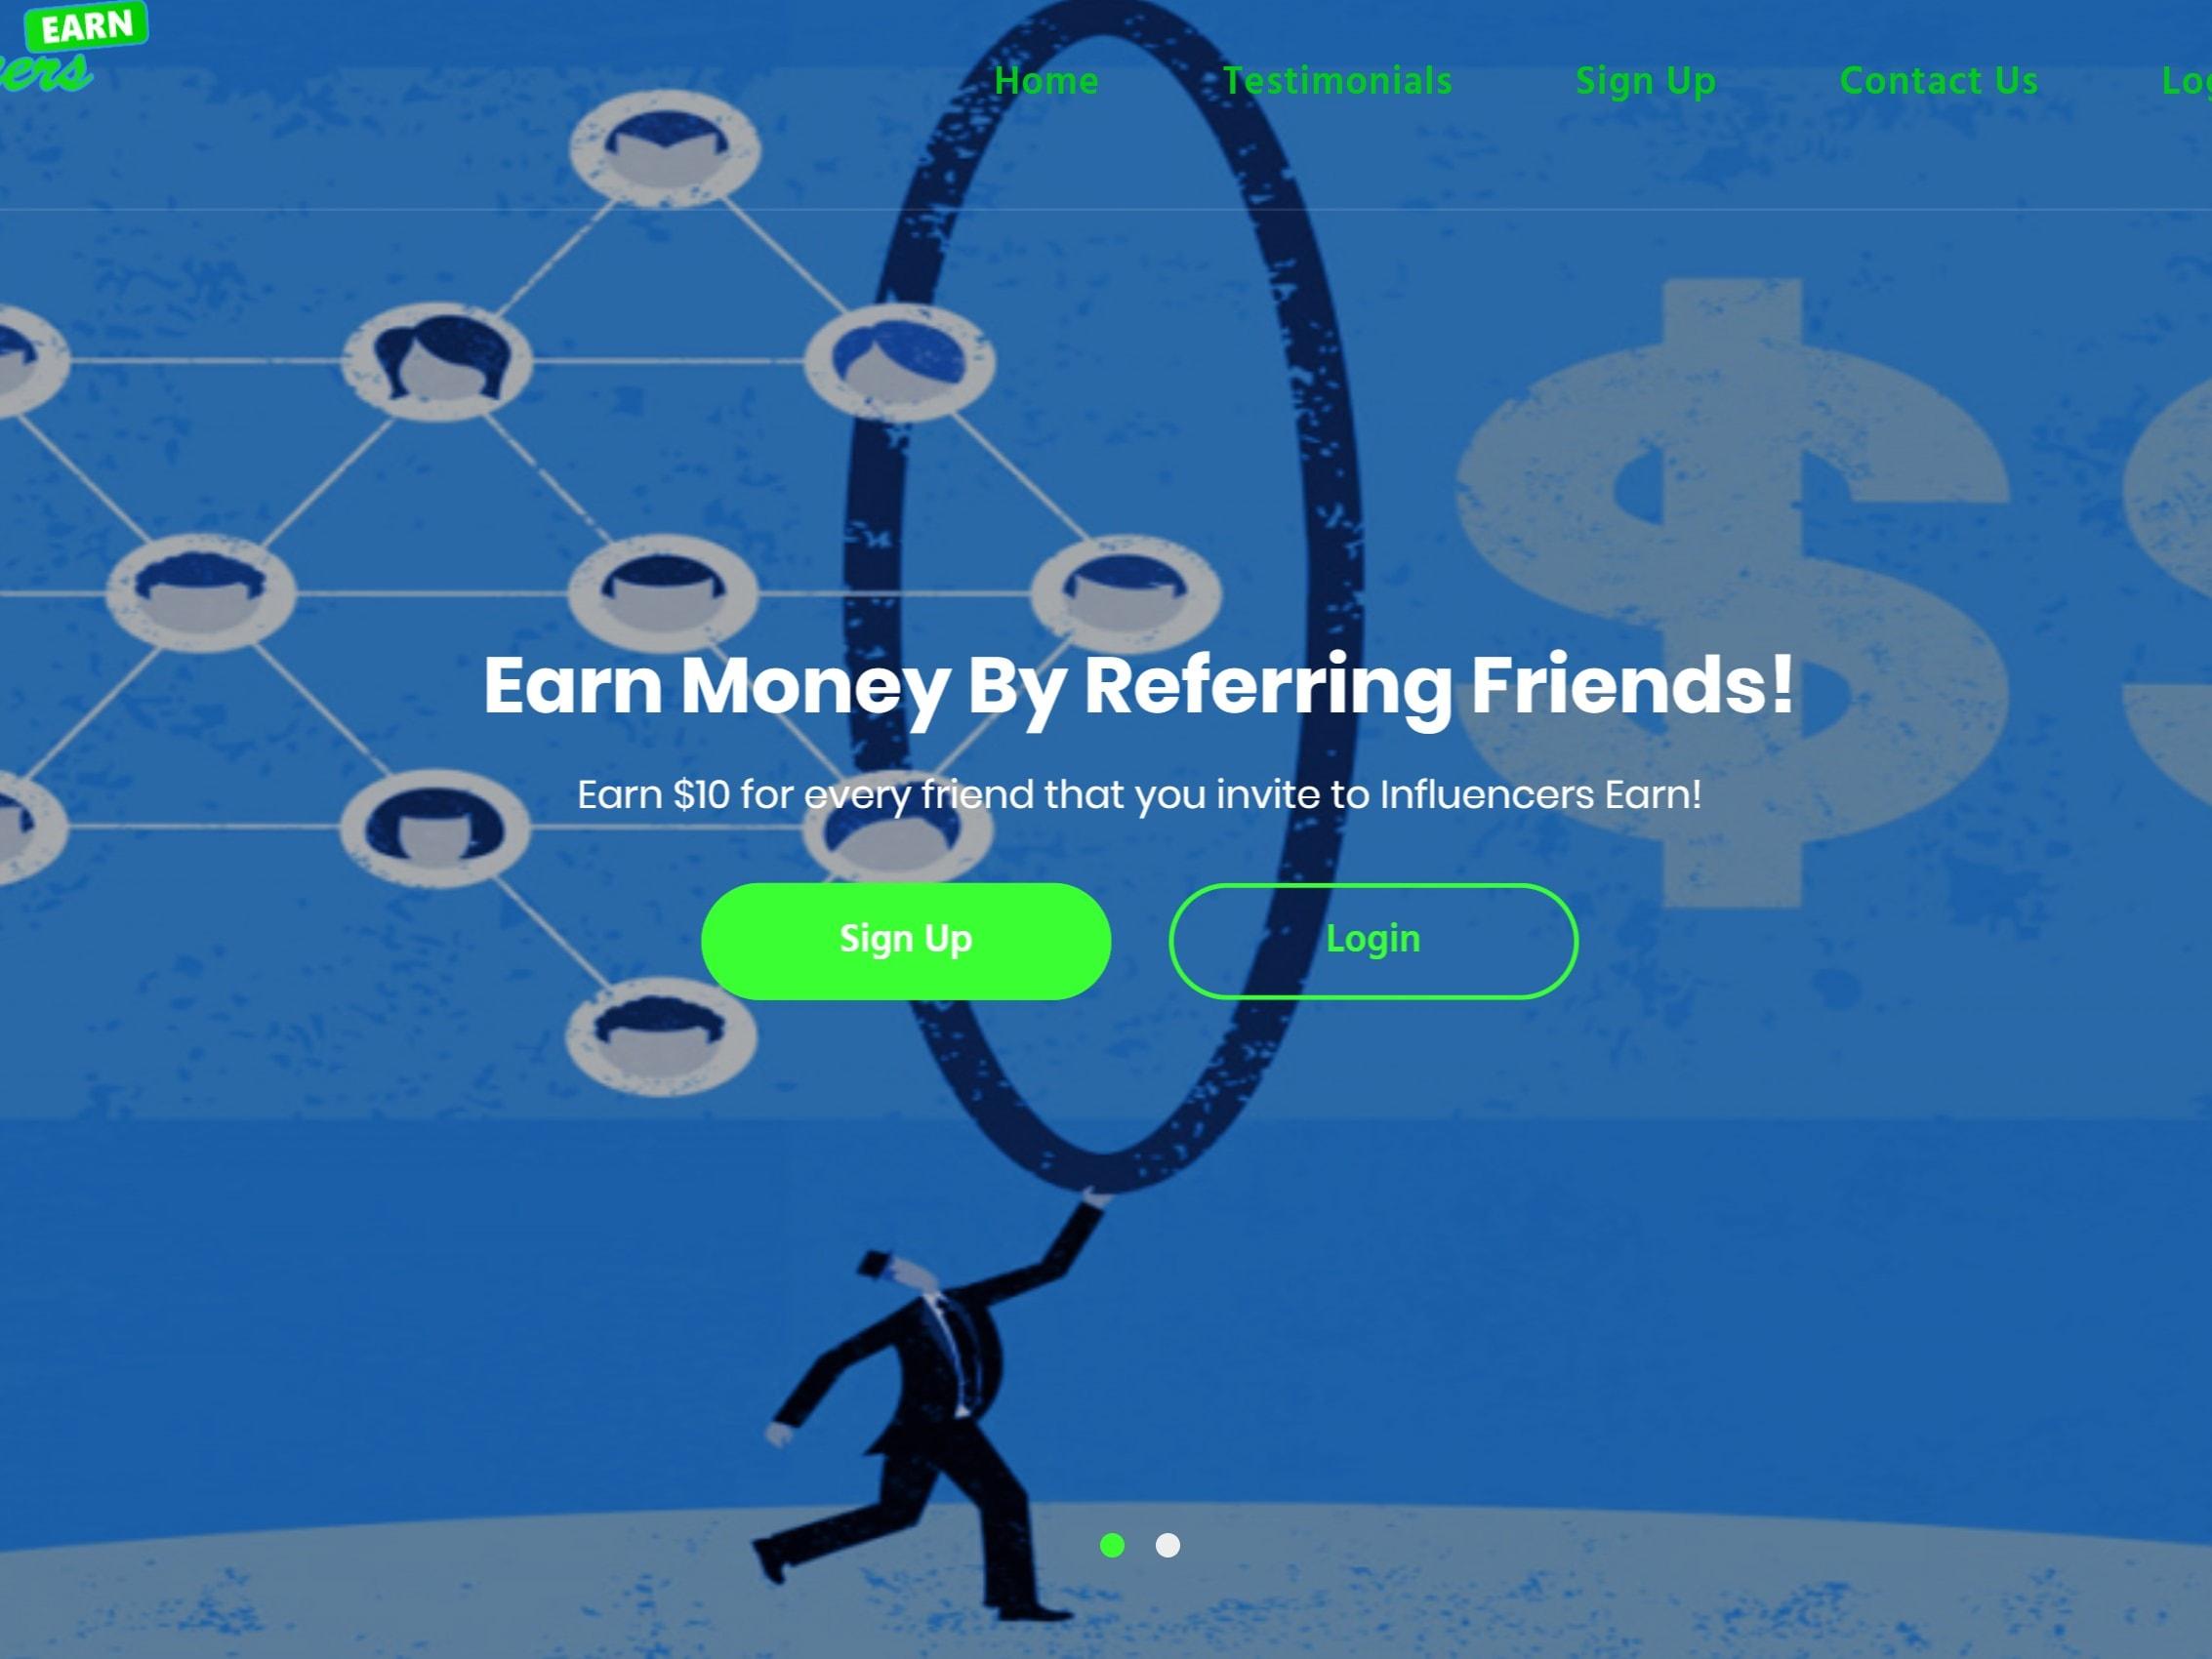 Earn $1,000 dollars in one day, $25 sign up bonus